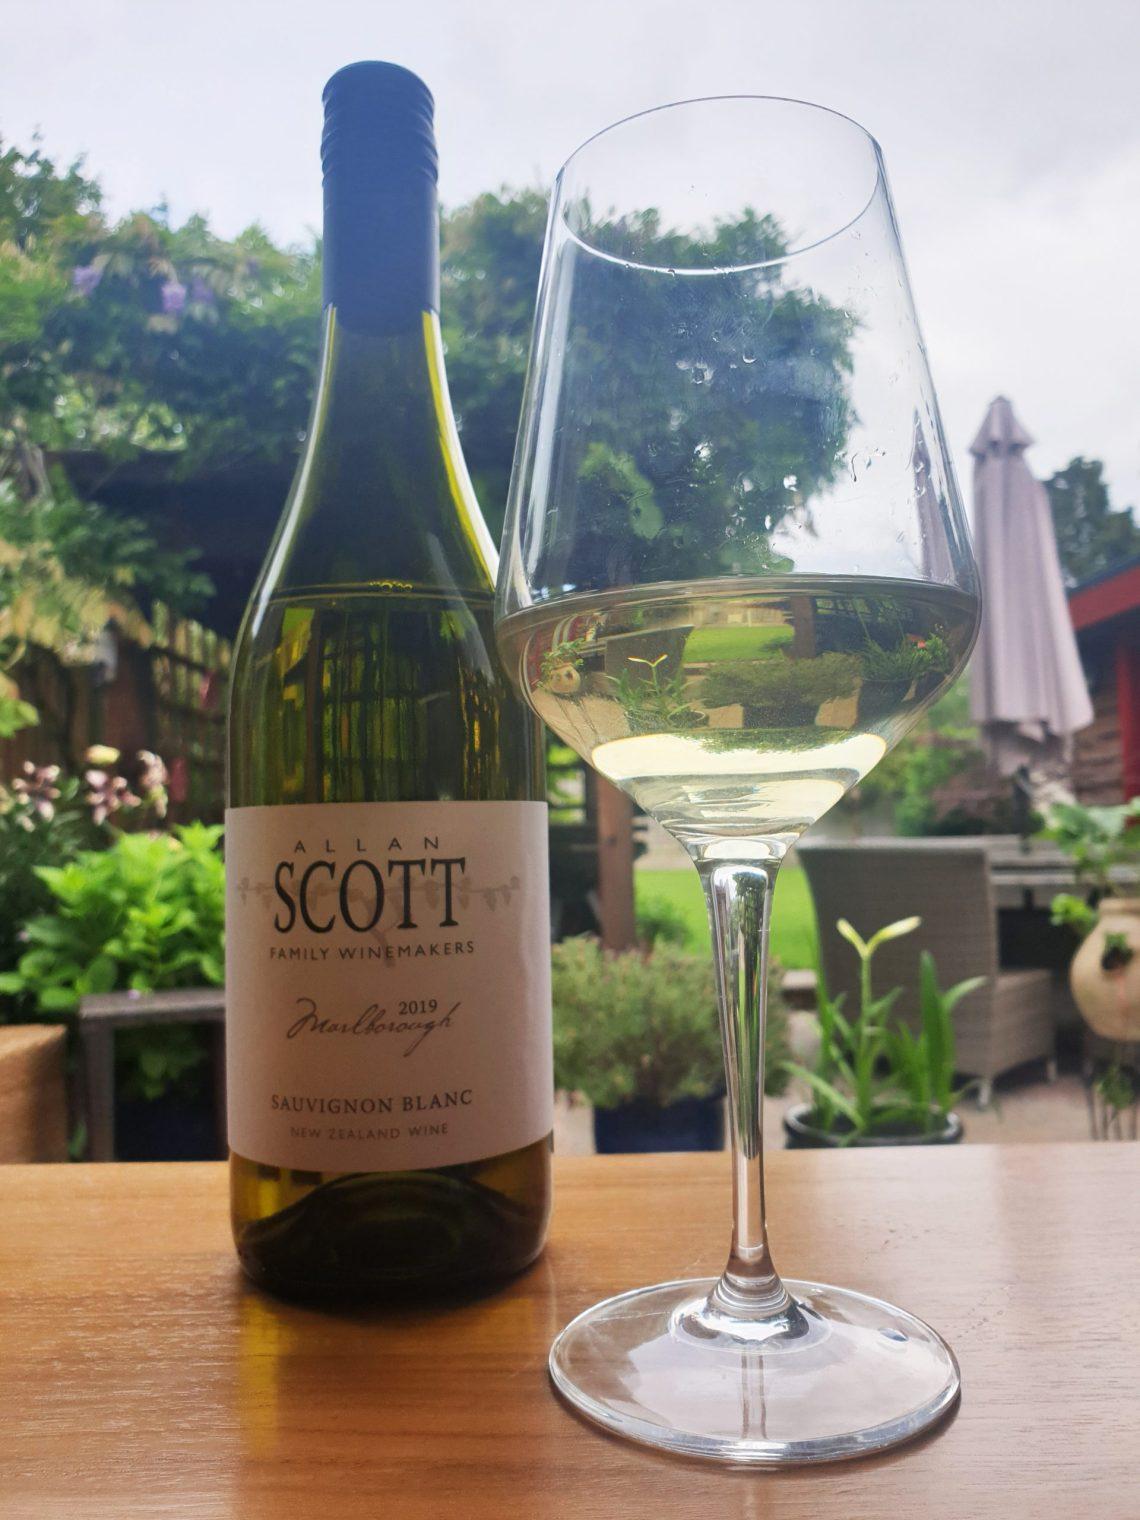 Allan Scott Family Winemakers Sauvignon Blanc.